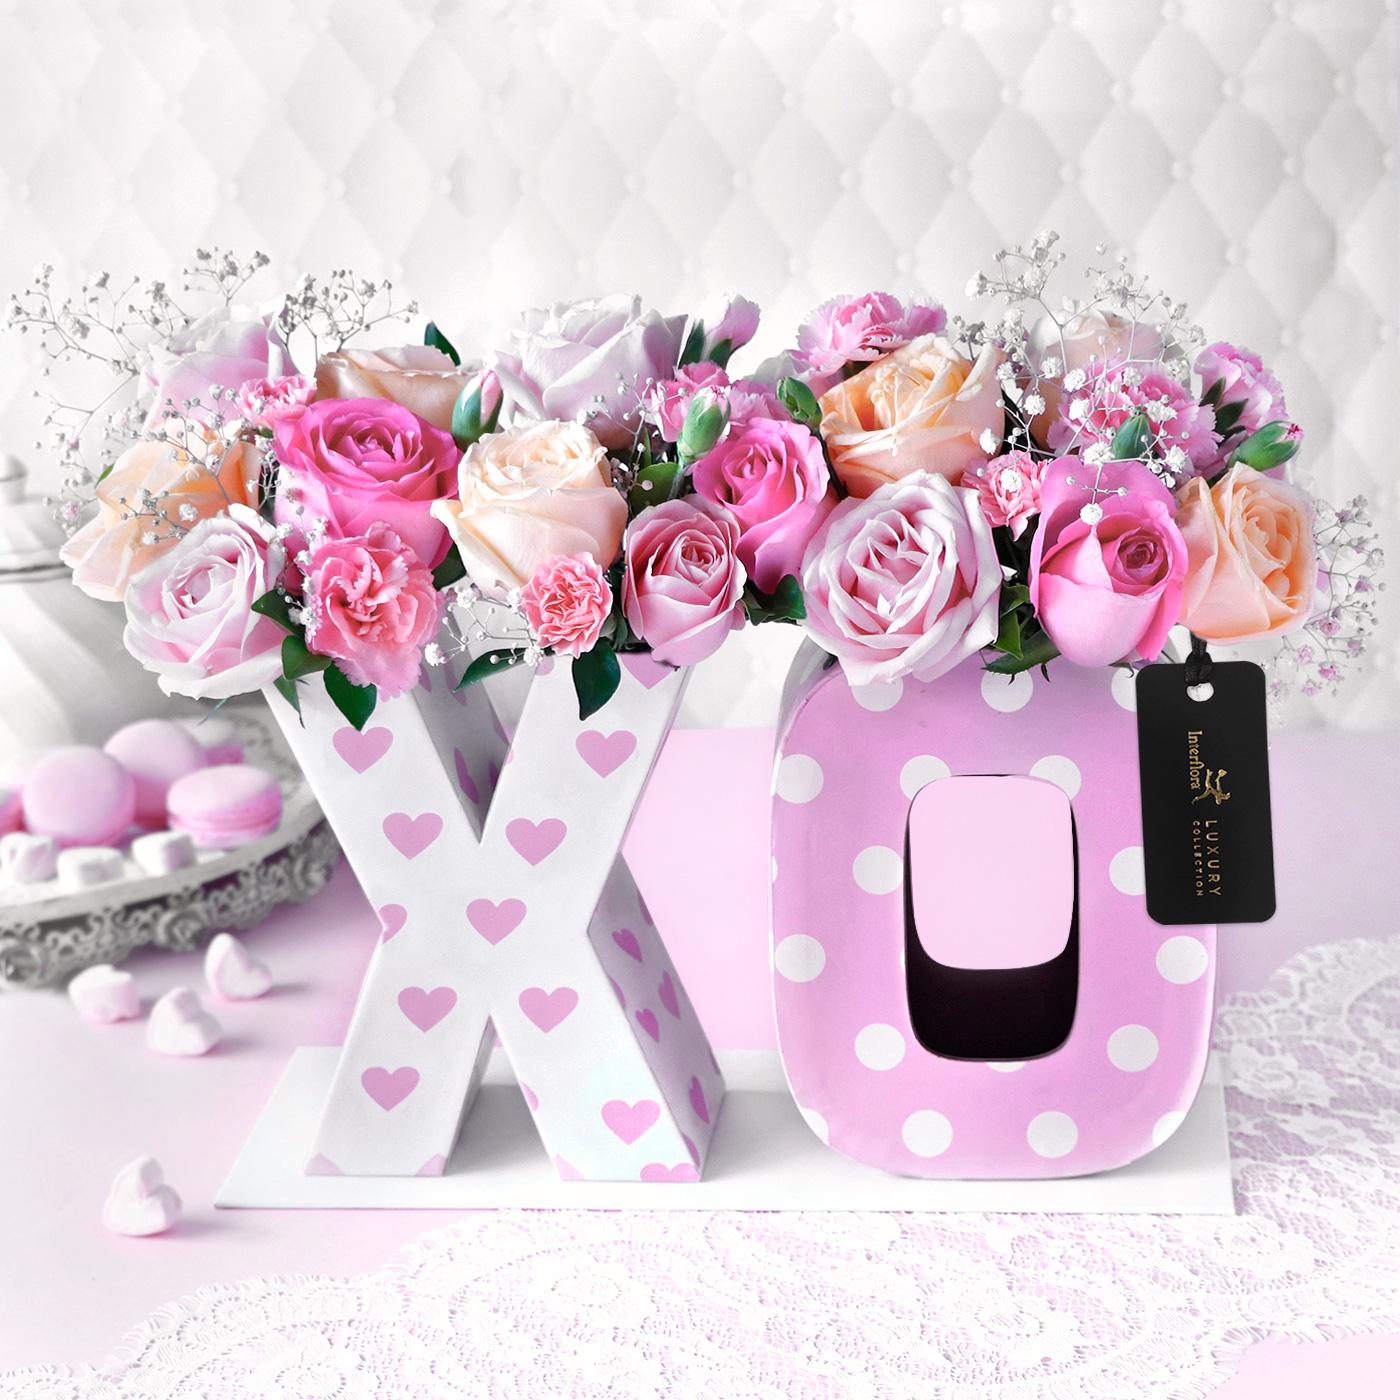 Your_love_is_like_XO